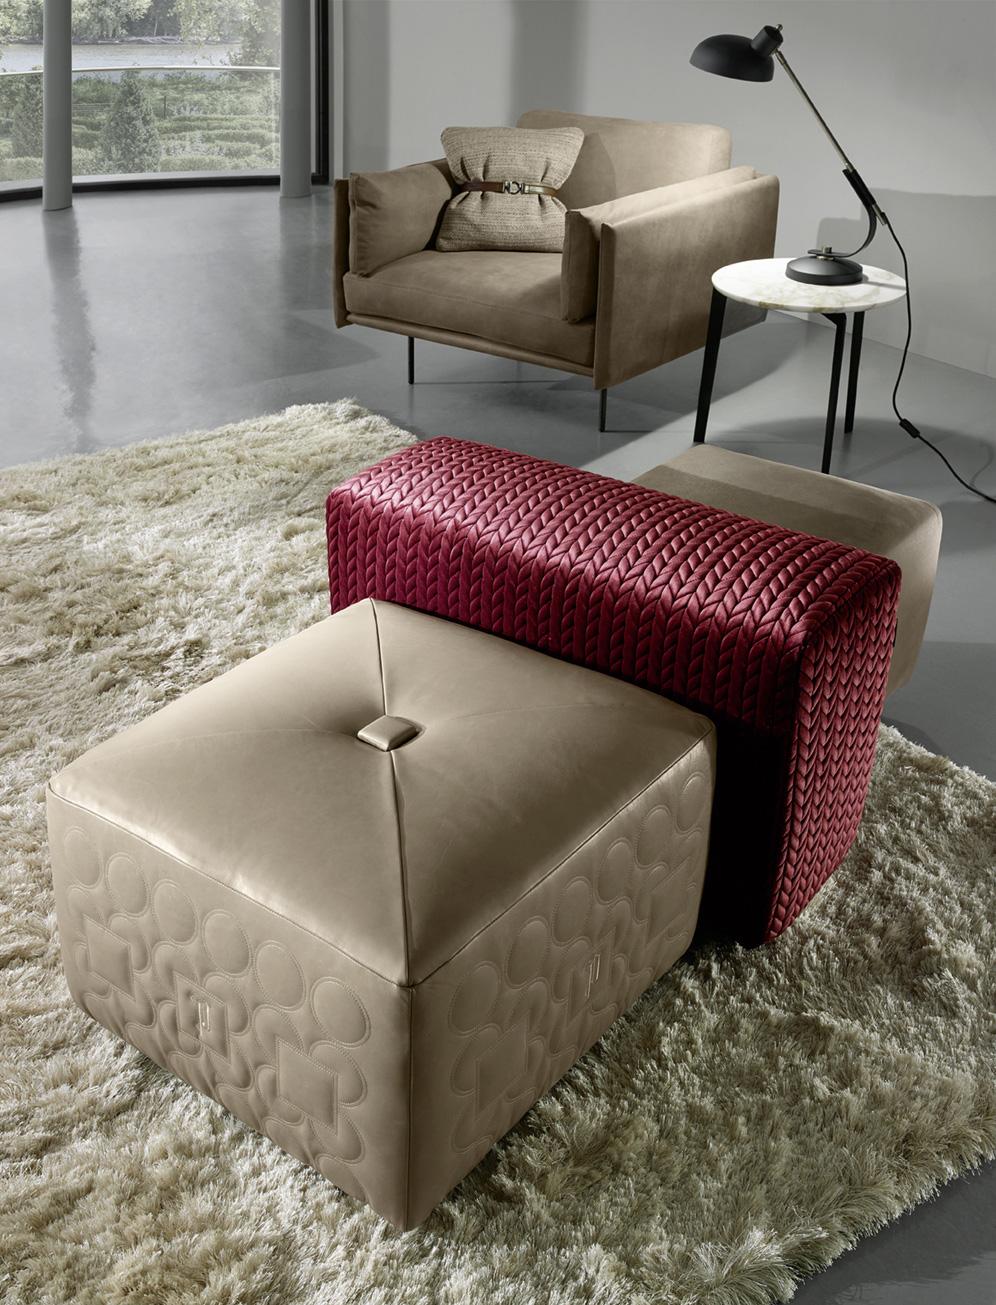 luxury pouf, stylish and modern seat, skampo mpez dermatino, stool dermatino monterno, luxury seat,